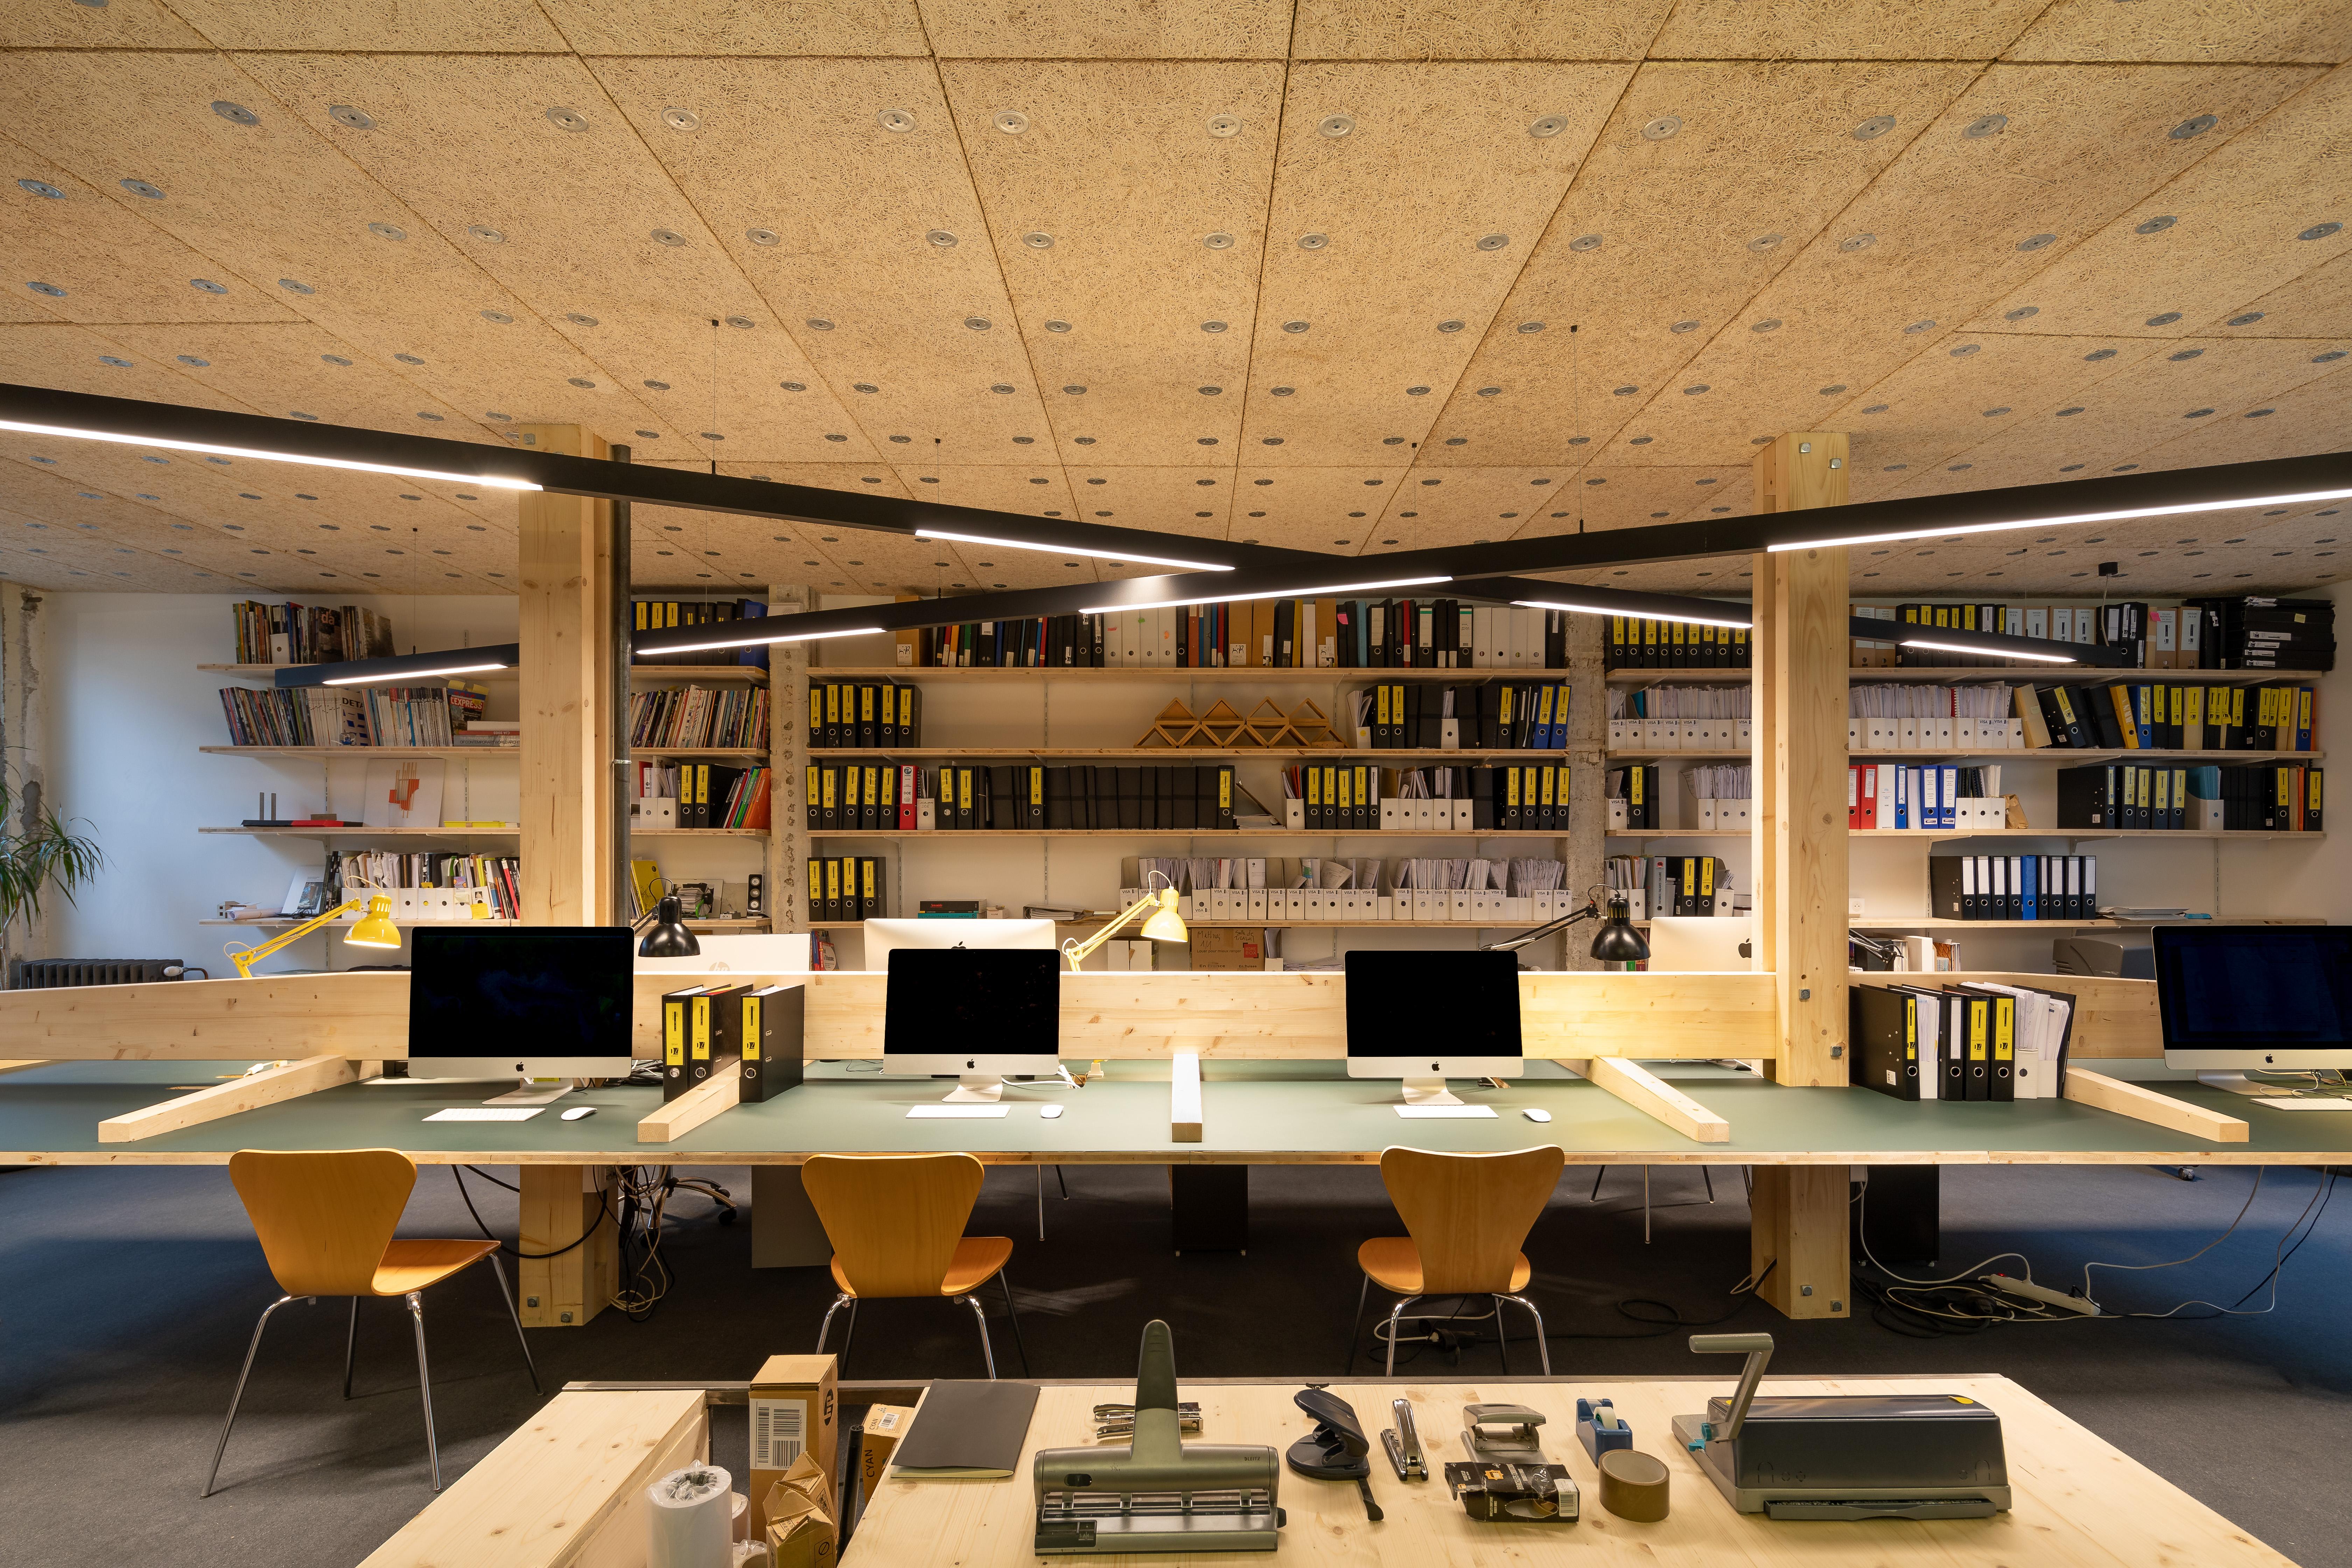 2001-Agence Onze04-Onze04 architectes-Nantes-F.Dantart-PROVISOIRE-1